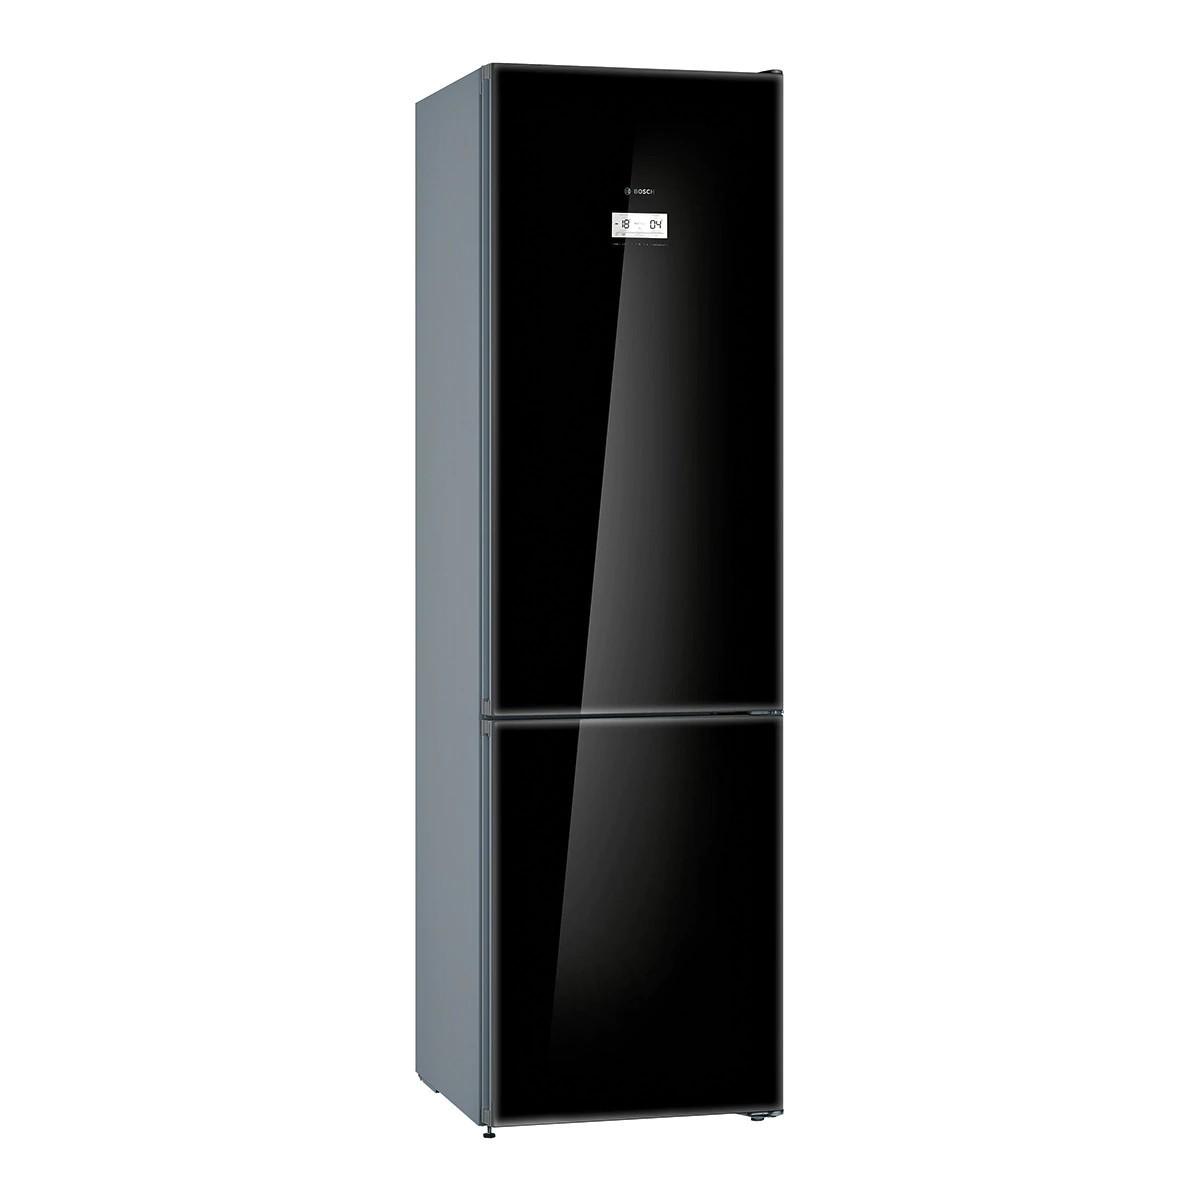 Combi Bosch Kgn39lbe5 203cm Nf Cristal Negro A++